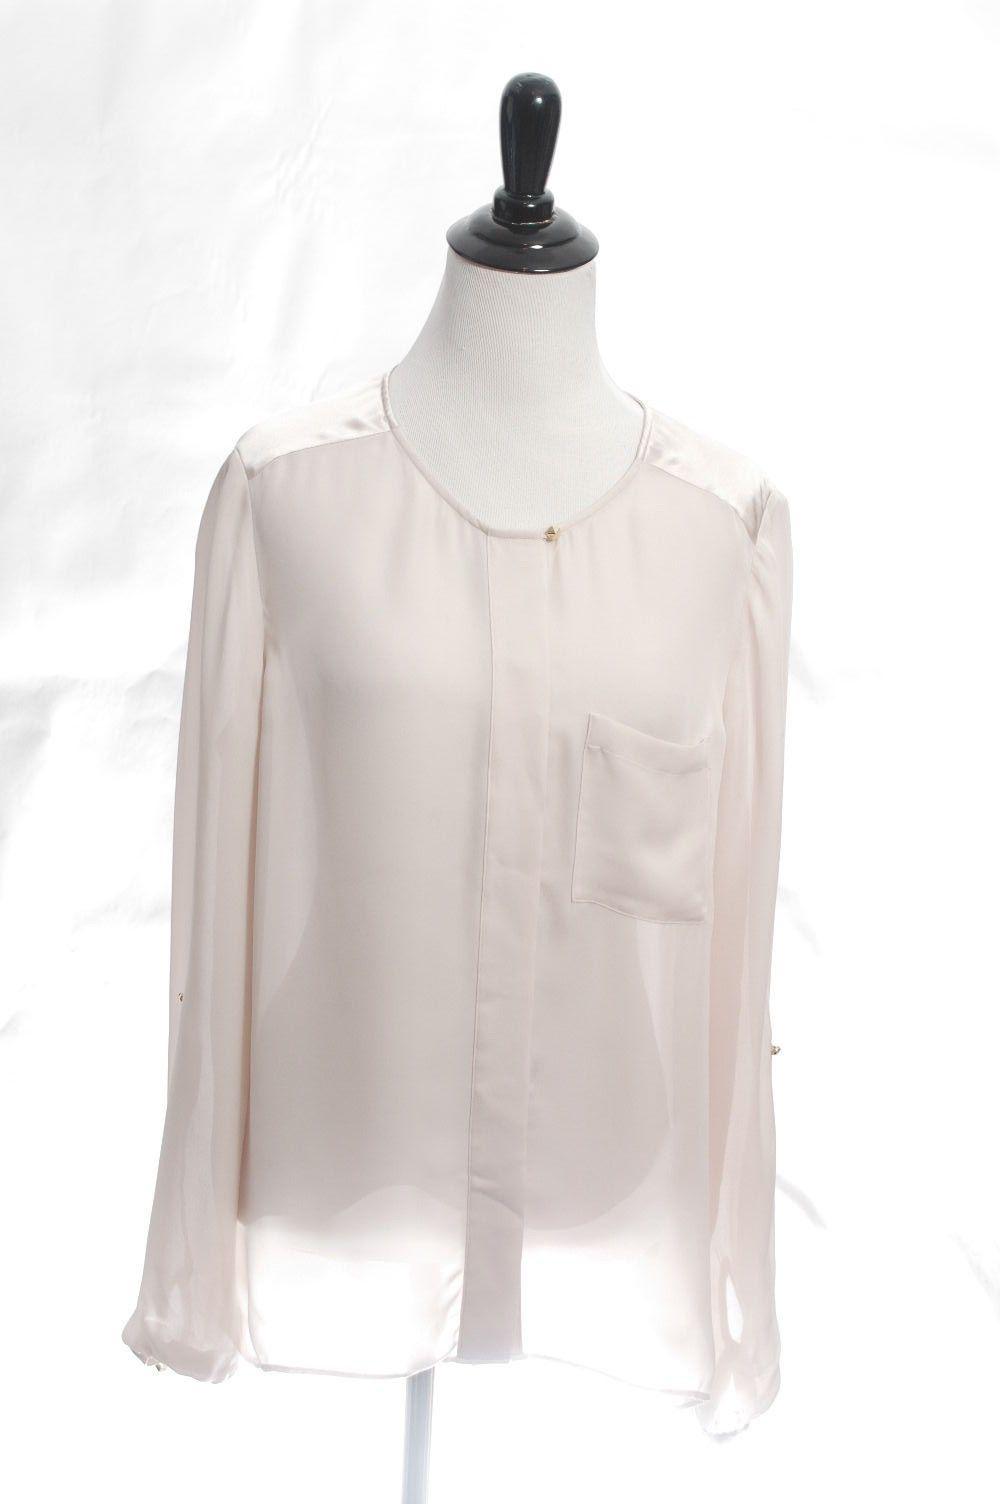 521dcbeb6e0b4 Massimo Dutti Designer Mulberry Silk Career Long 3 4 Sleeve Zara M Blouse  Shirt